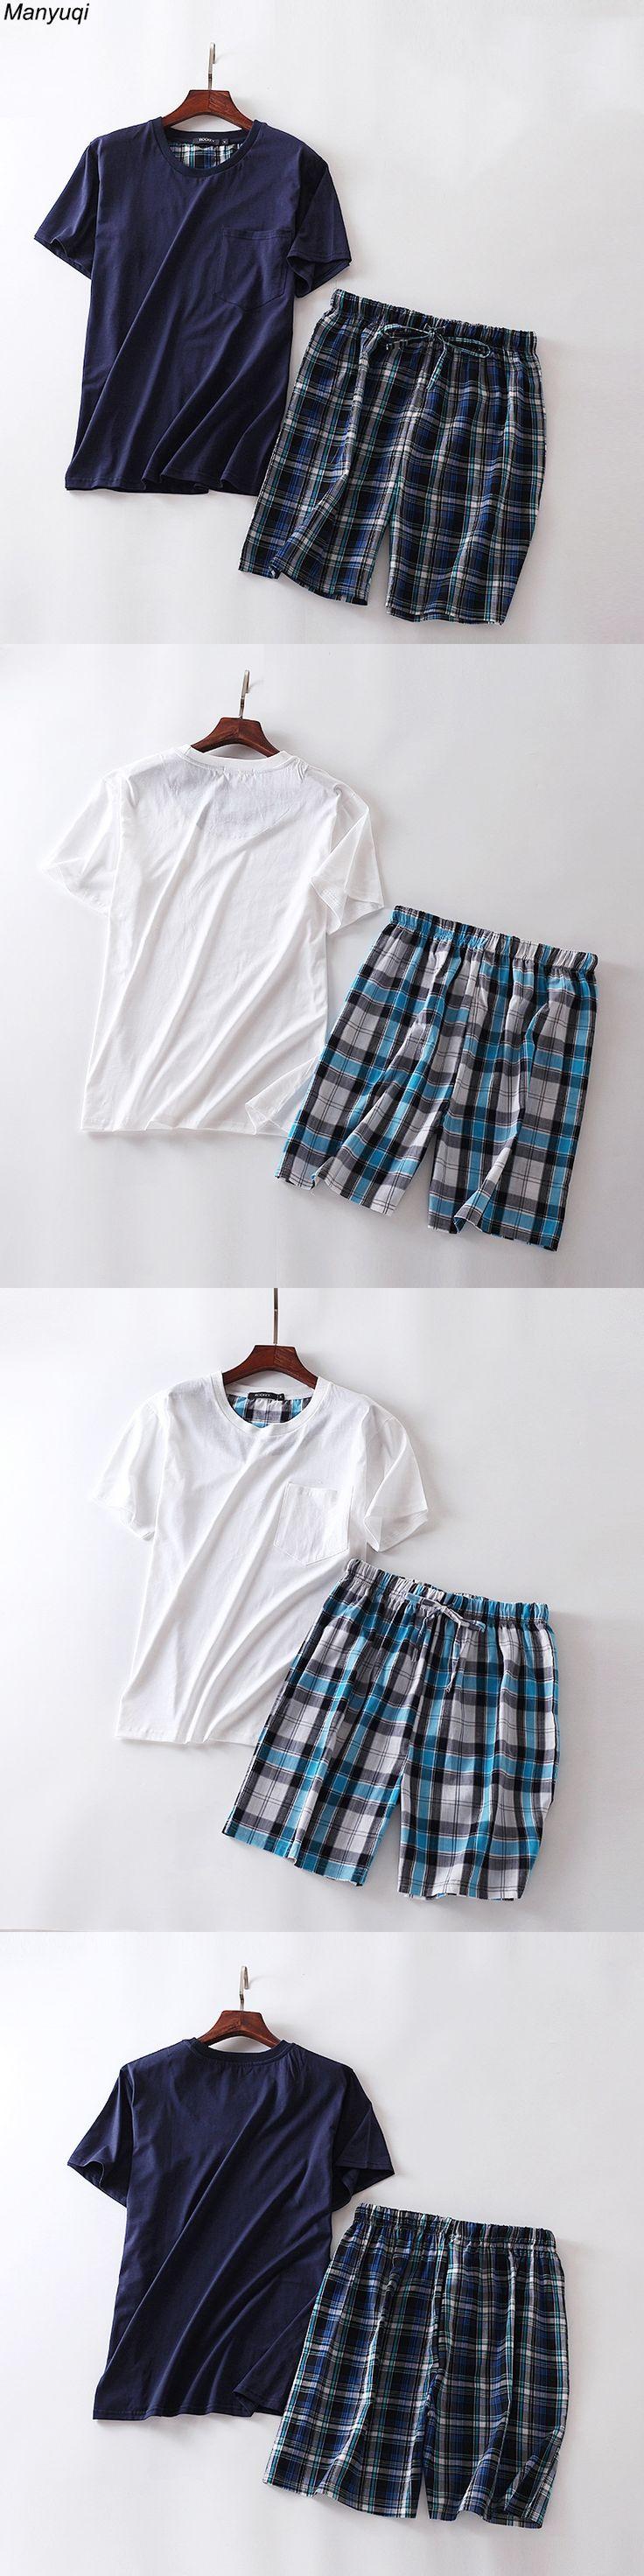 Cotton pajamas for men short sleeve and grid mid pants lounge&home sleepwear pajamas set man